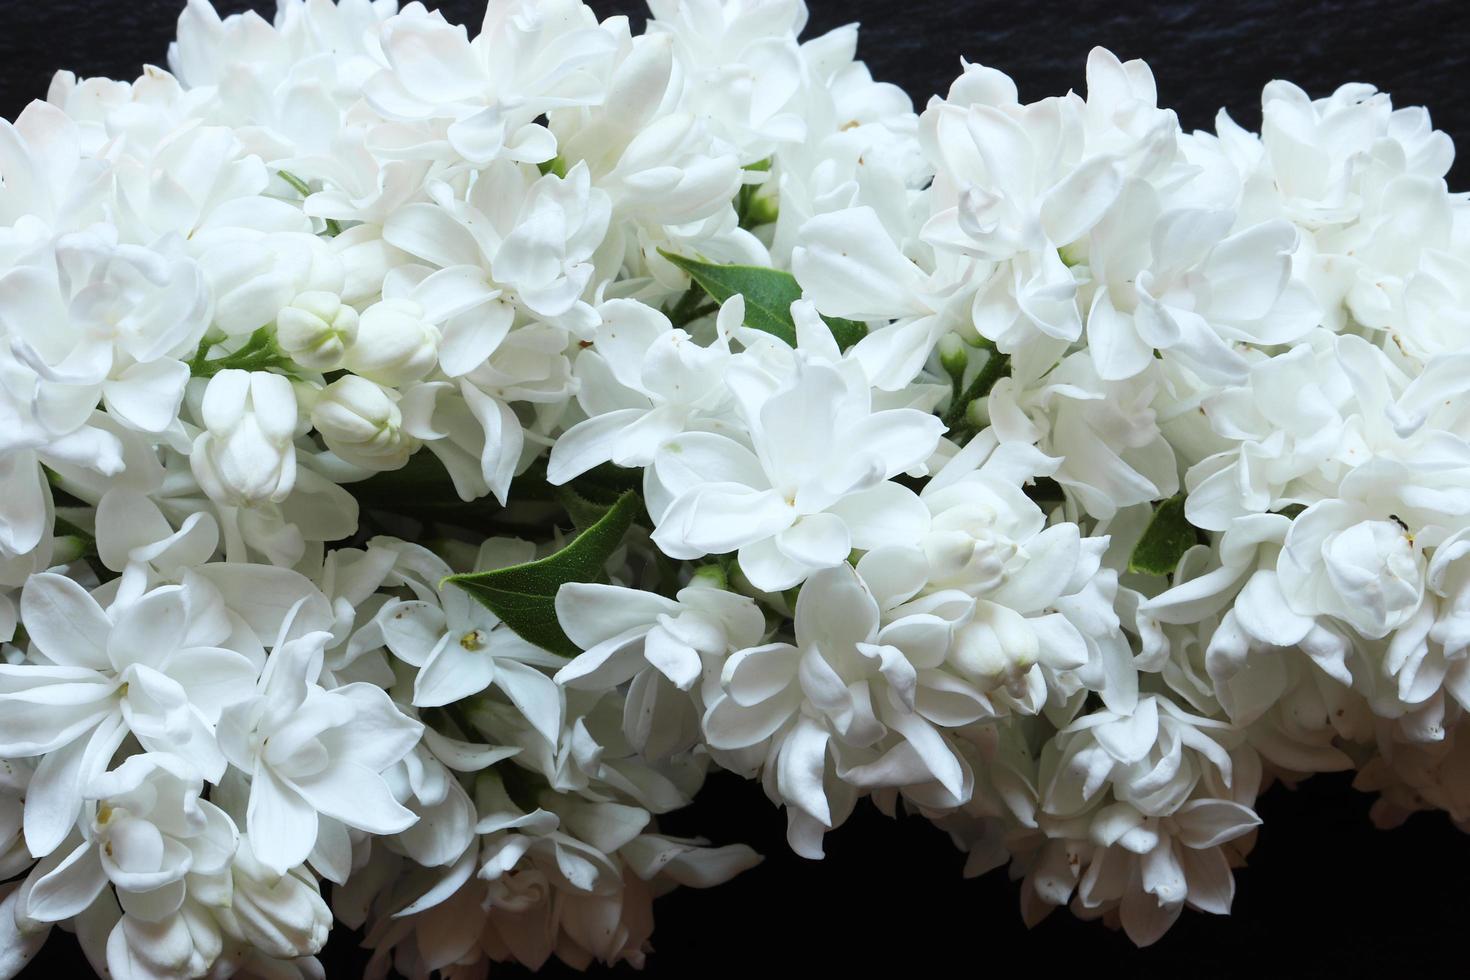 fond de fleurs lilas blanc photo